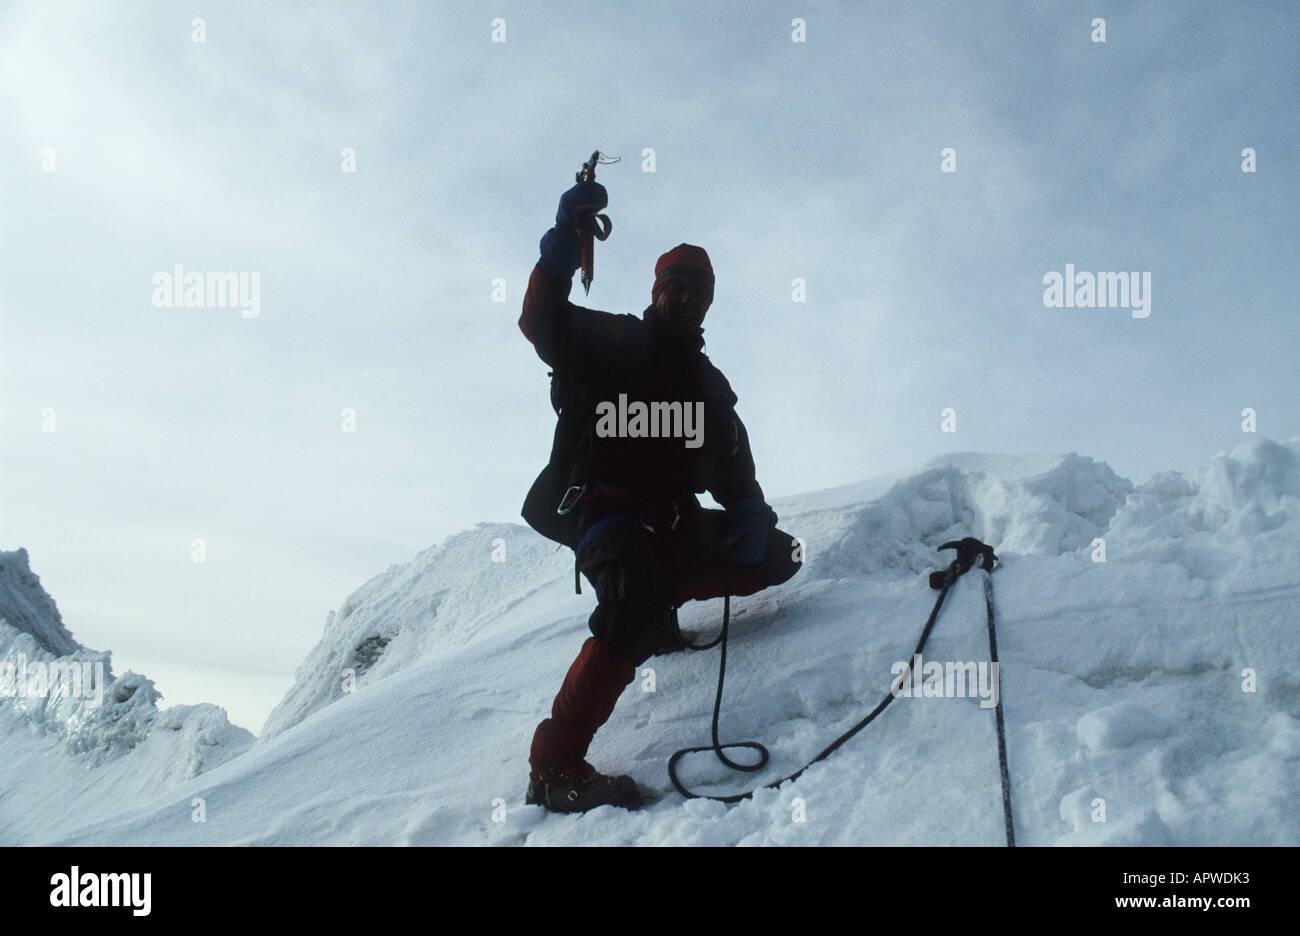 Cheering alpinist on the summmit of the 6088 m high Huyana Potosi, 25 km north of La Paz, Bolivia. - Stock Image